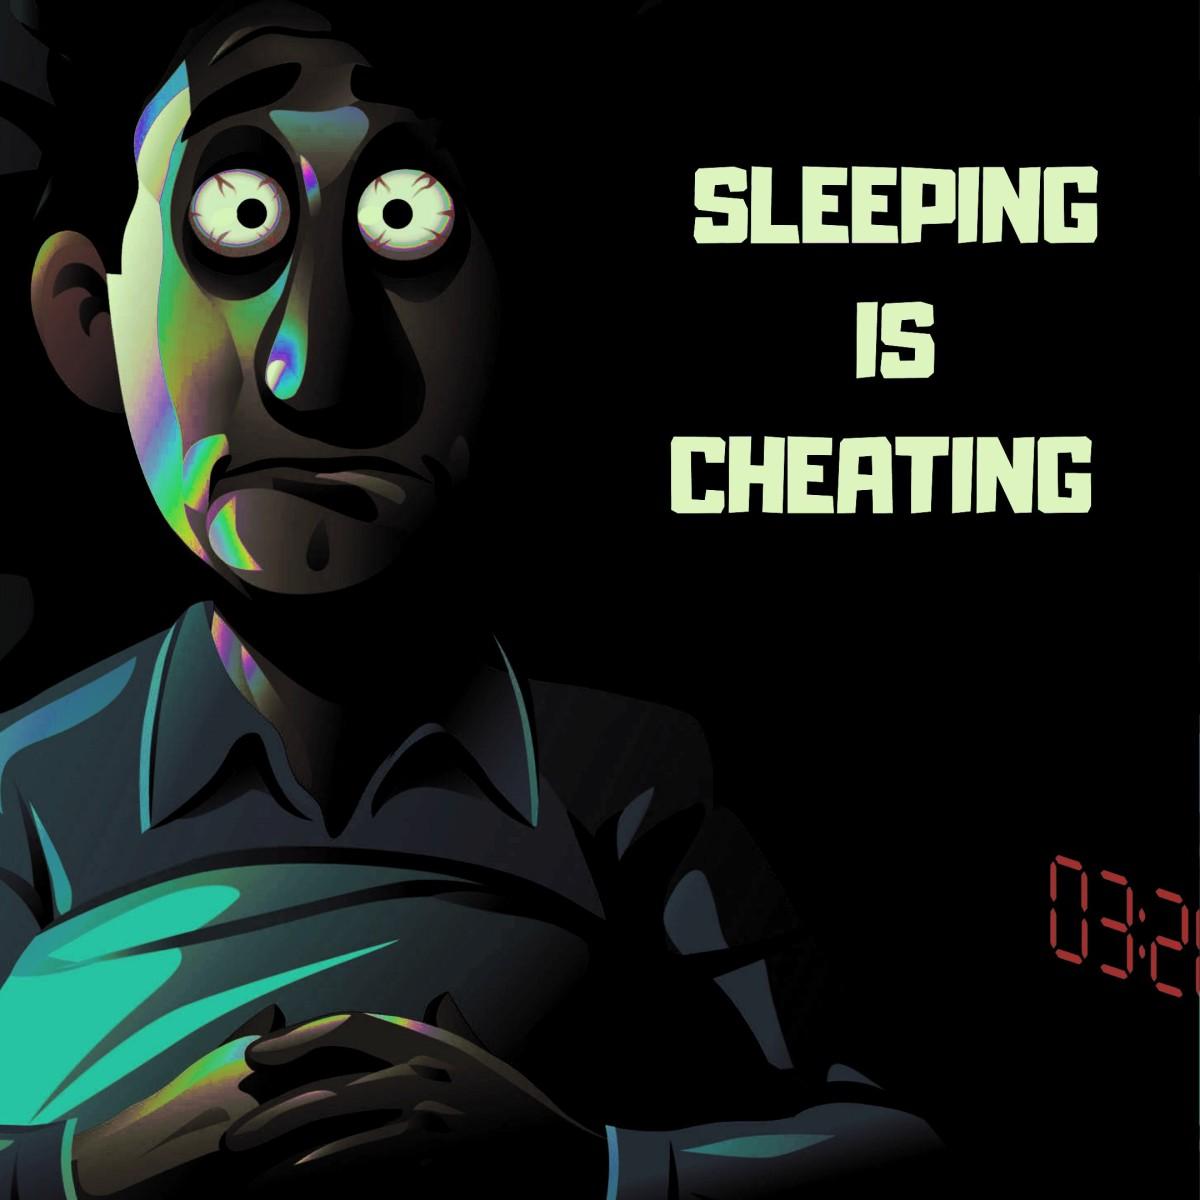 Sleeping is cheating